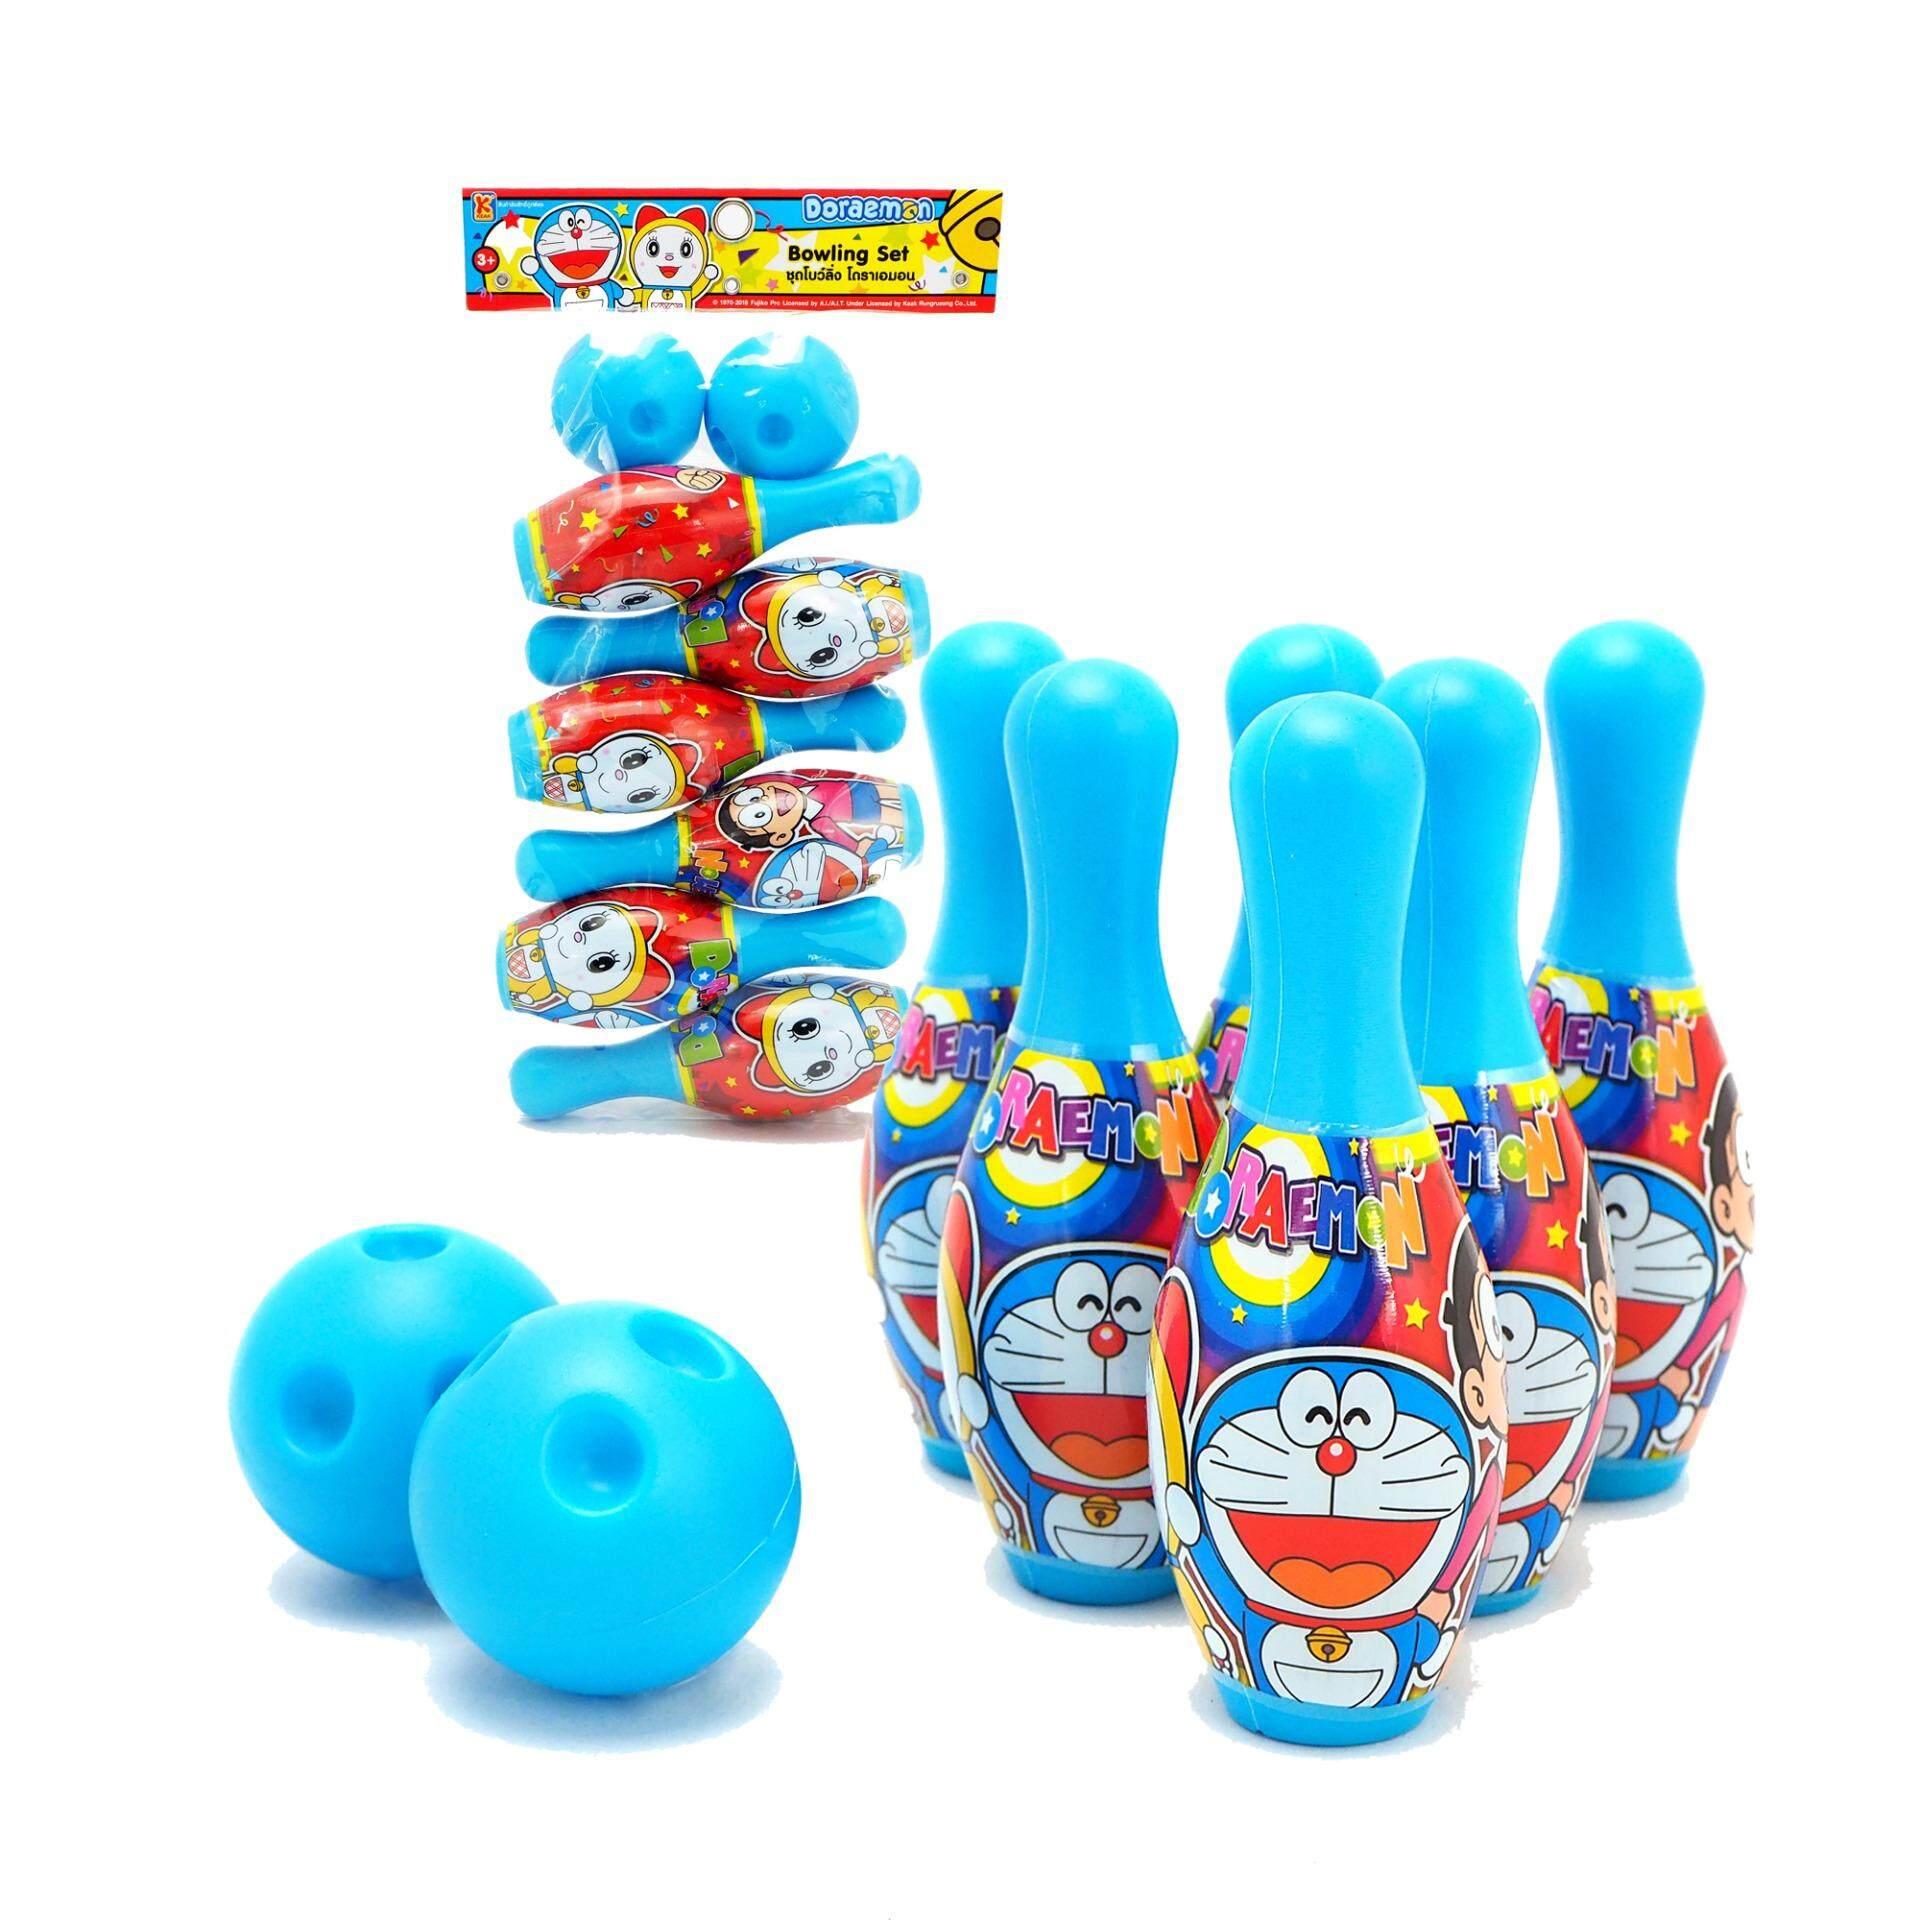 Powertoys ชุดโบว์ลิ่ง โดราเอมอน ลายลิขสิทธิ์แท้ขนาด ย 18*ก 4.3*ส 30 ซม. By Power Toys.